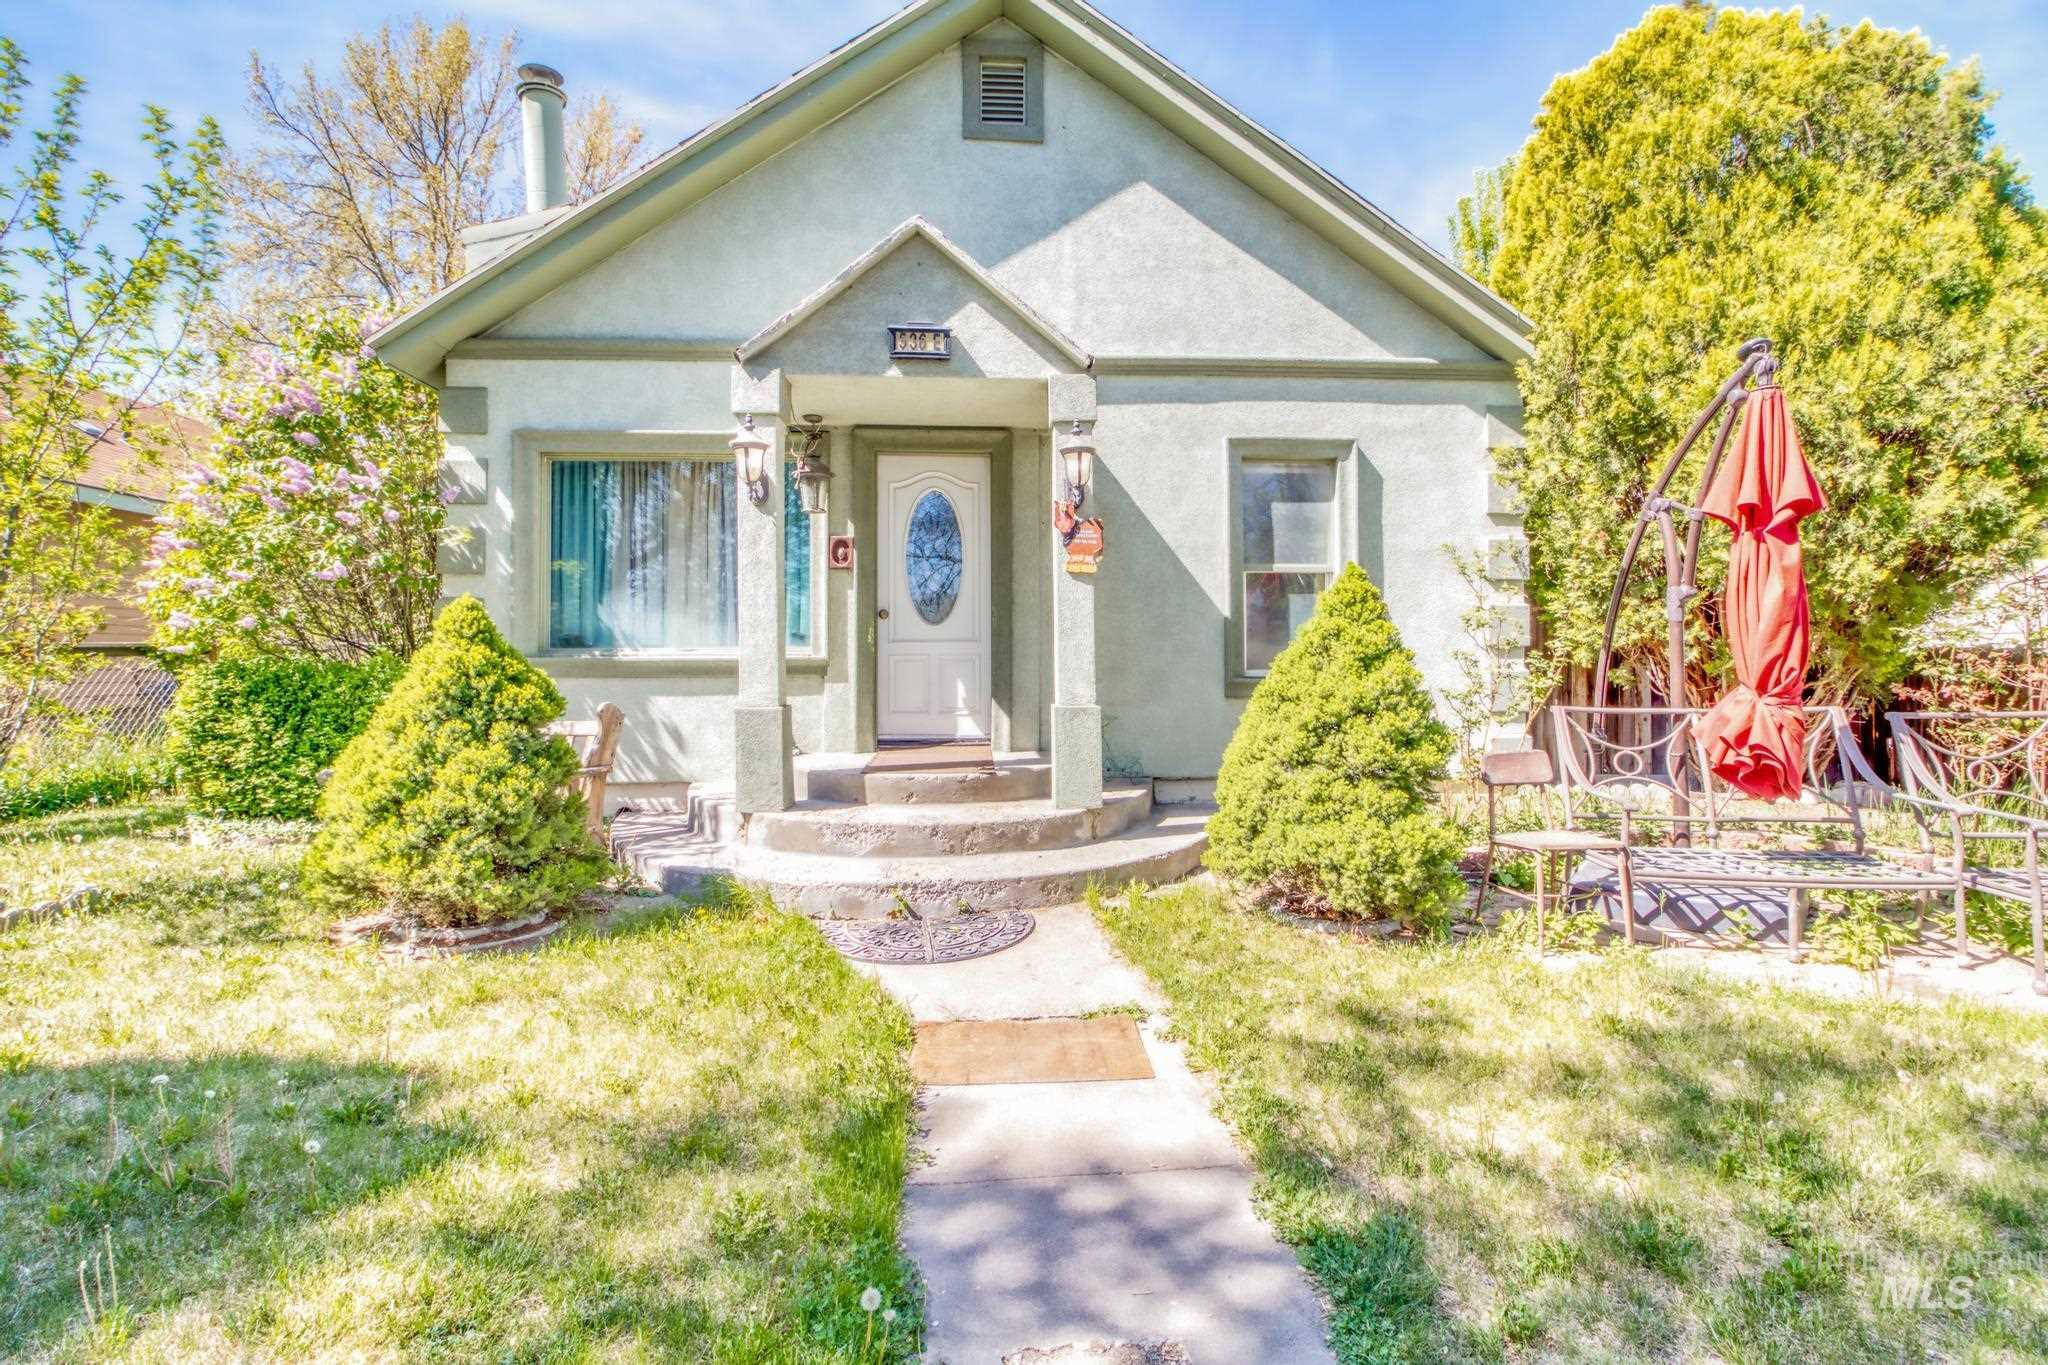 536 E 4th Ave Property Photo - Twin Falls, ID real estate listing